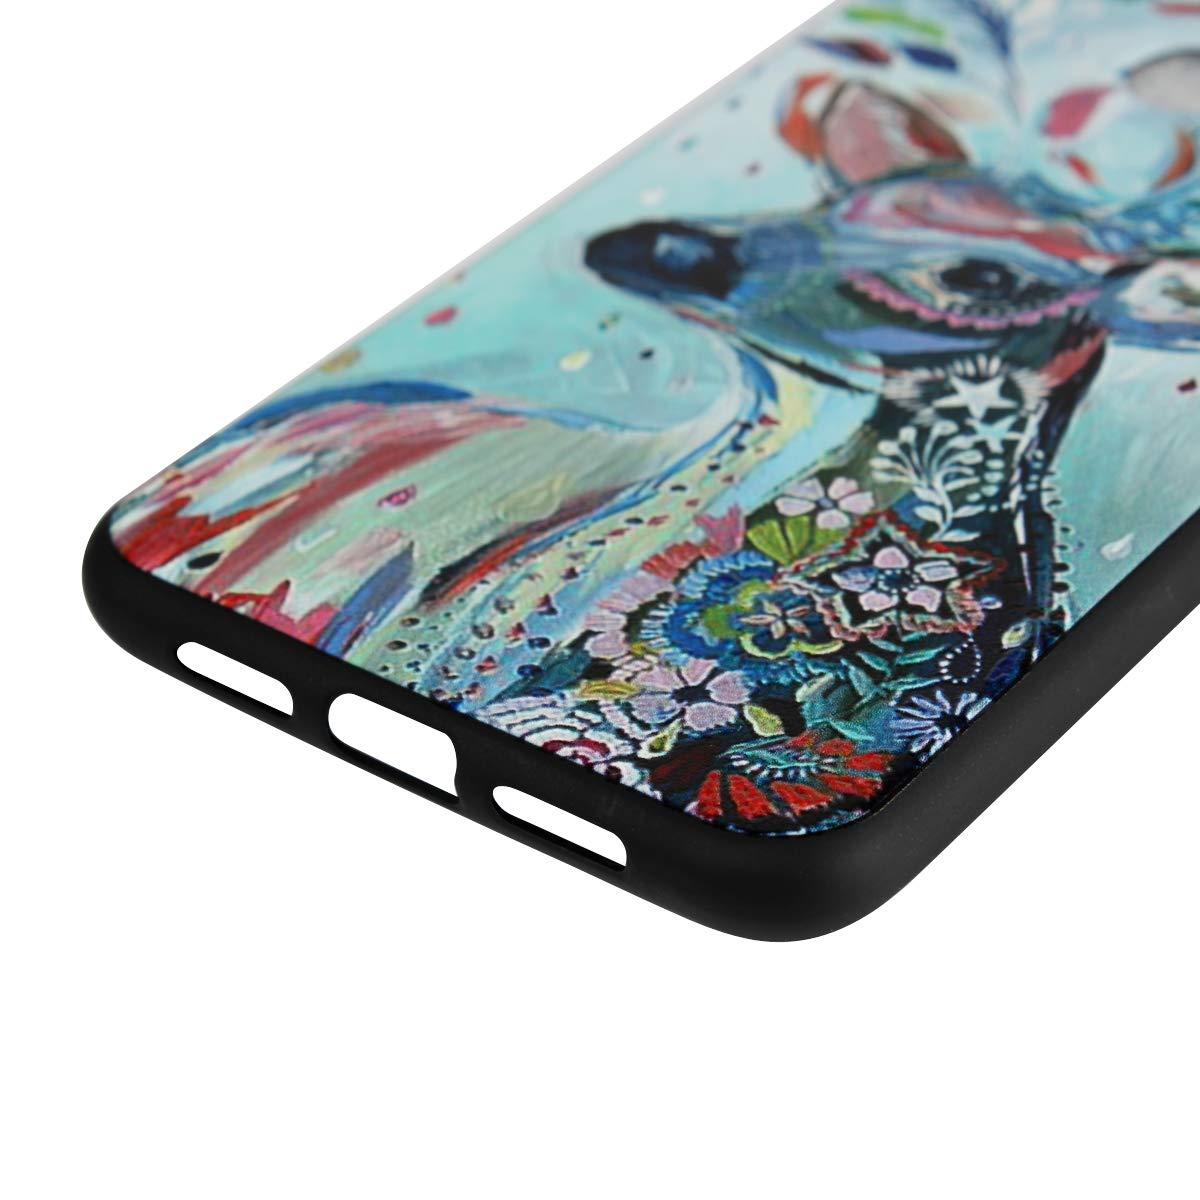 FANFO Xiaomi Mi 8 Lite TPU 3D Funda + 3 Unidades Protector, Cubierta Delgado TPU 3D Funda Protective Case Cover/Cristal Templado para: Amazon.es: ...